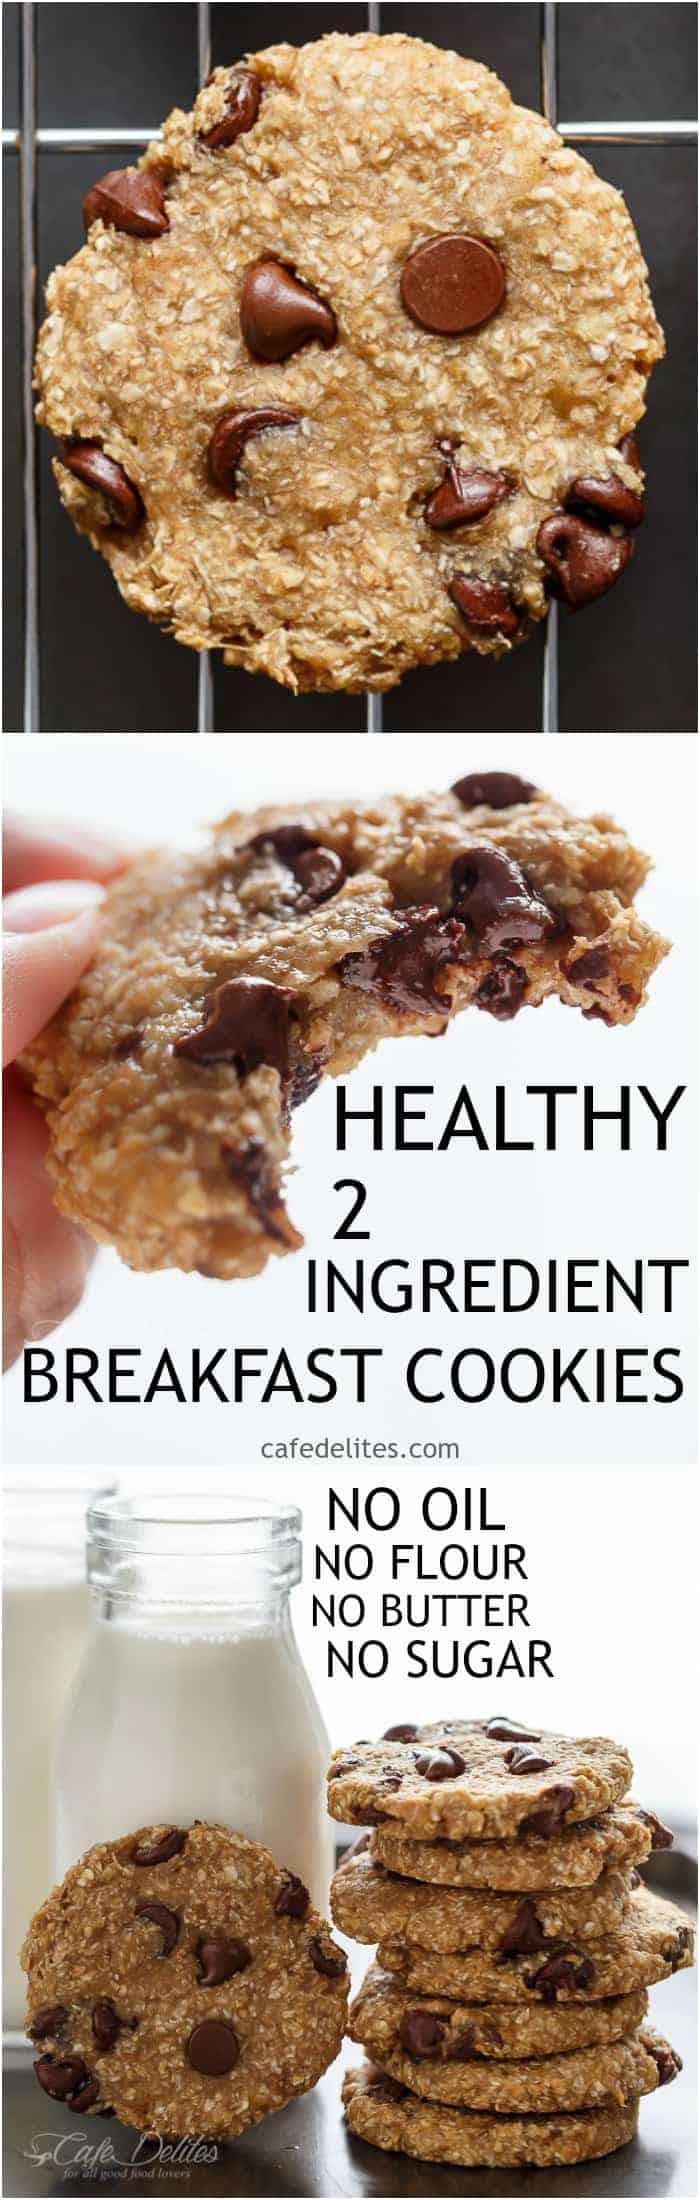 Healthy Breakfast Cookies  Healthy 2 Ingre nt Breakfast Cookies Cafe Delites